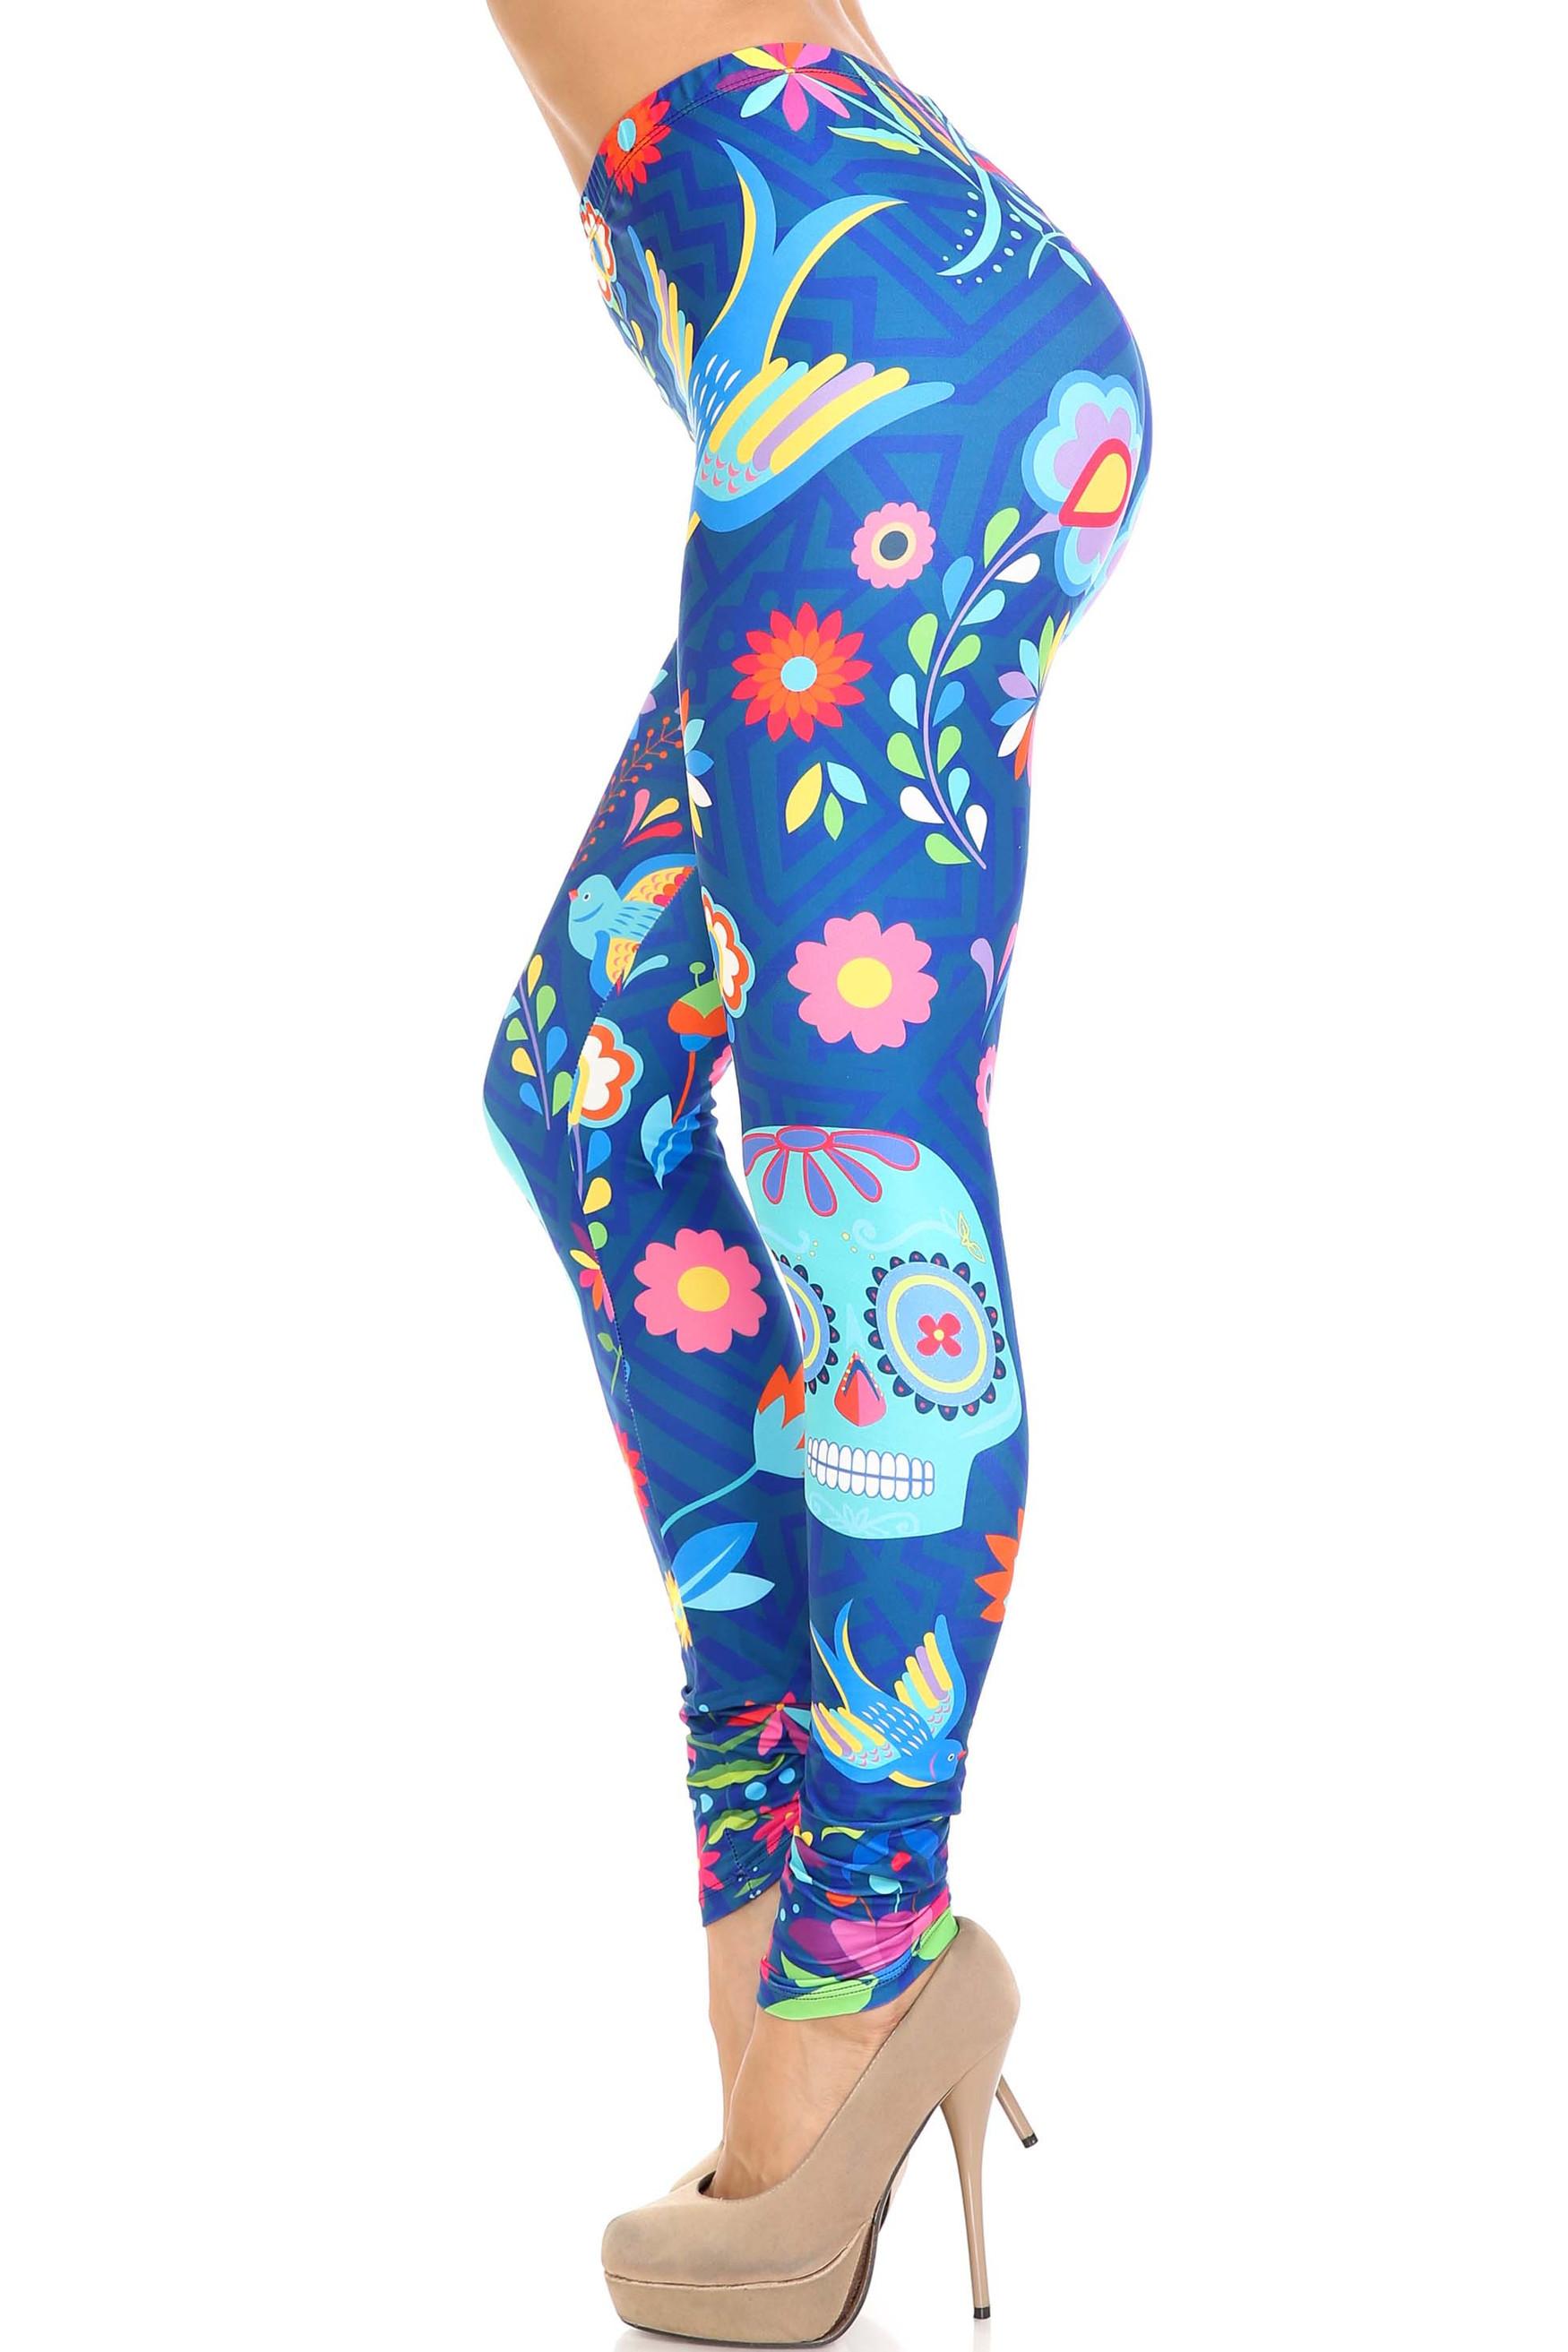 Creamy Soft Garden of Eden Sugar Skull Extra Plus Size Leggings - 3X-5X - USA Fashion™